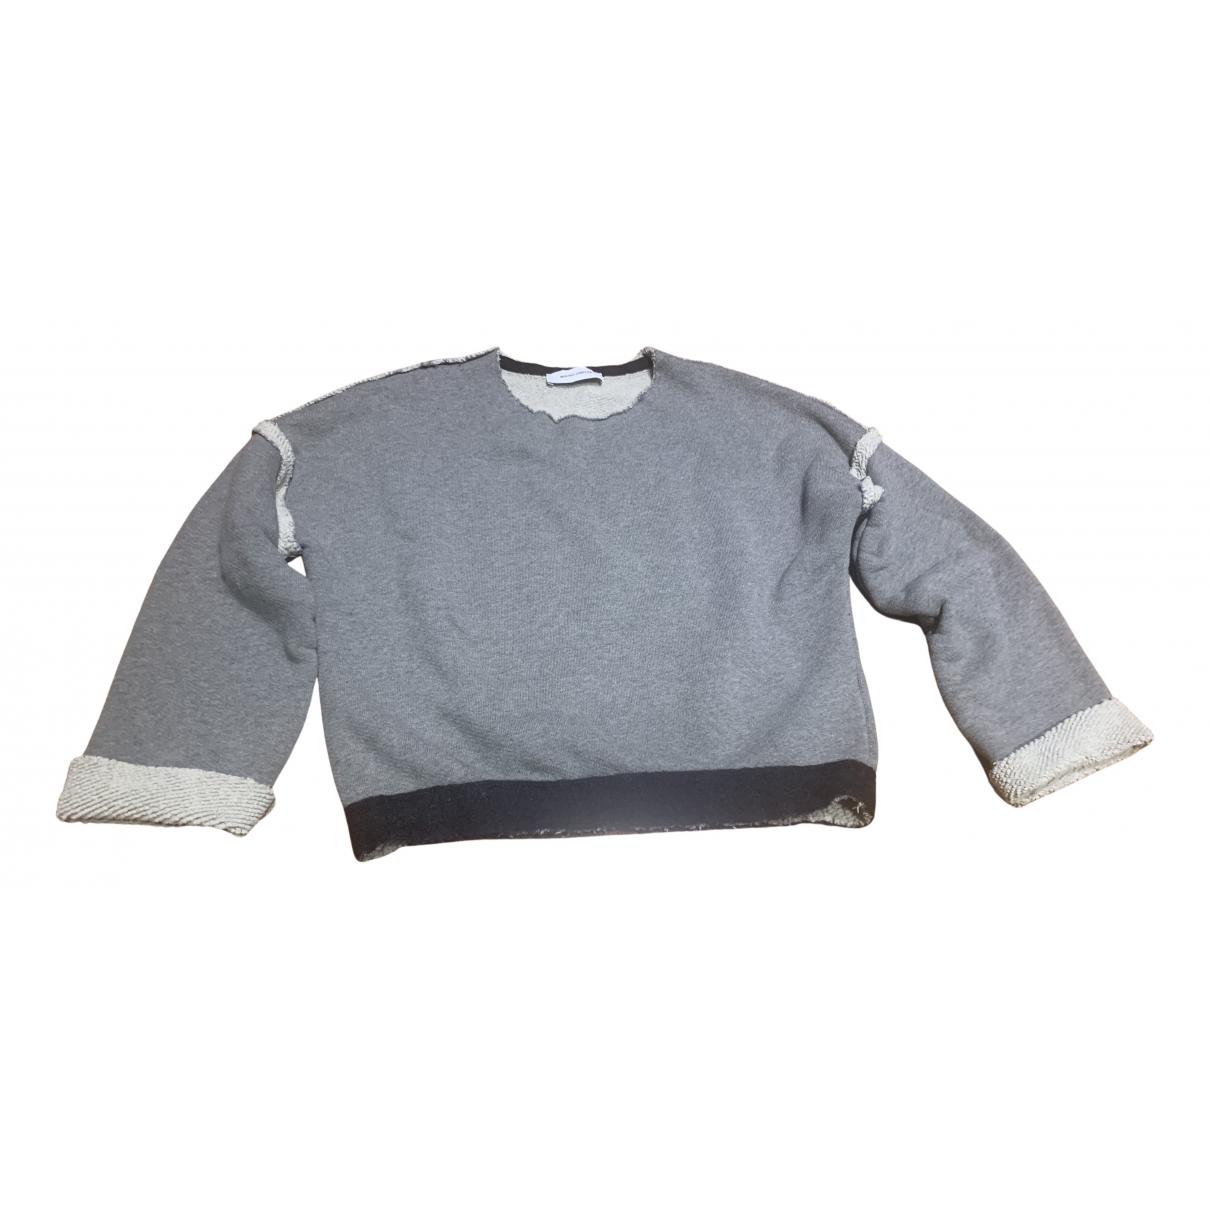 Mauro Grifoni N Grey Cotton Knitwear for Women 42 IT